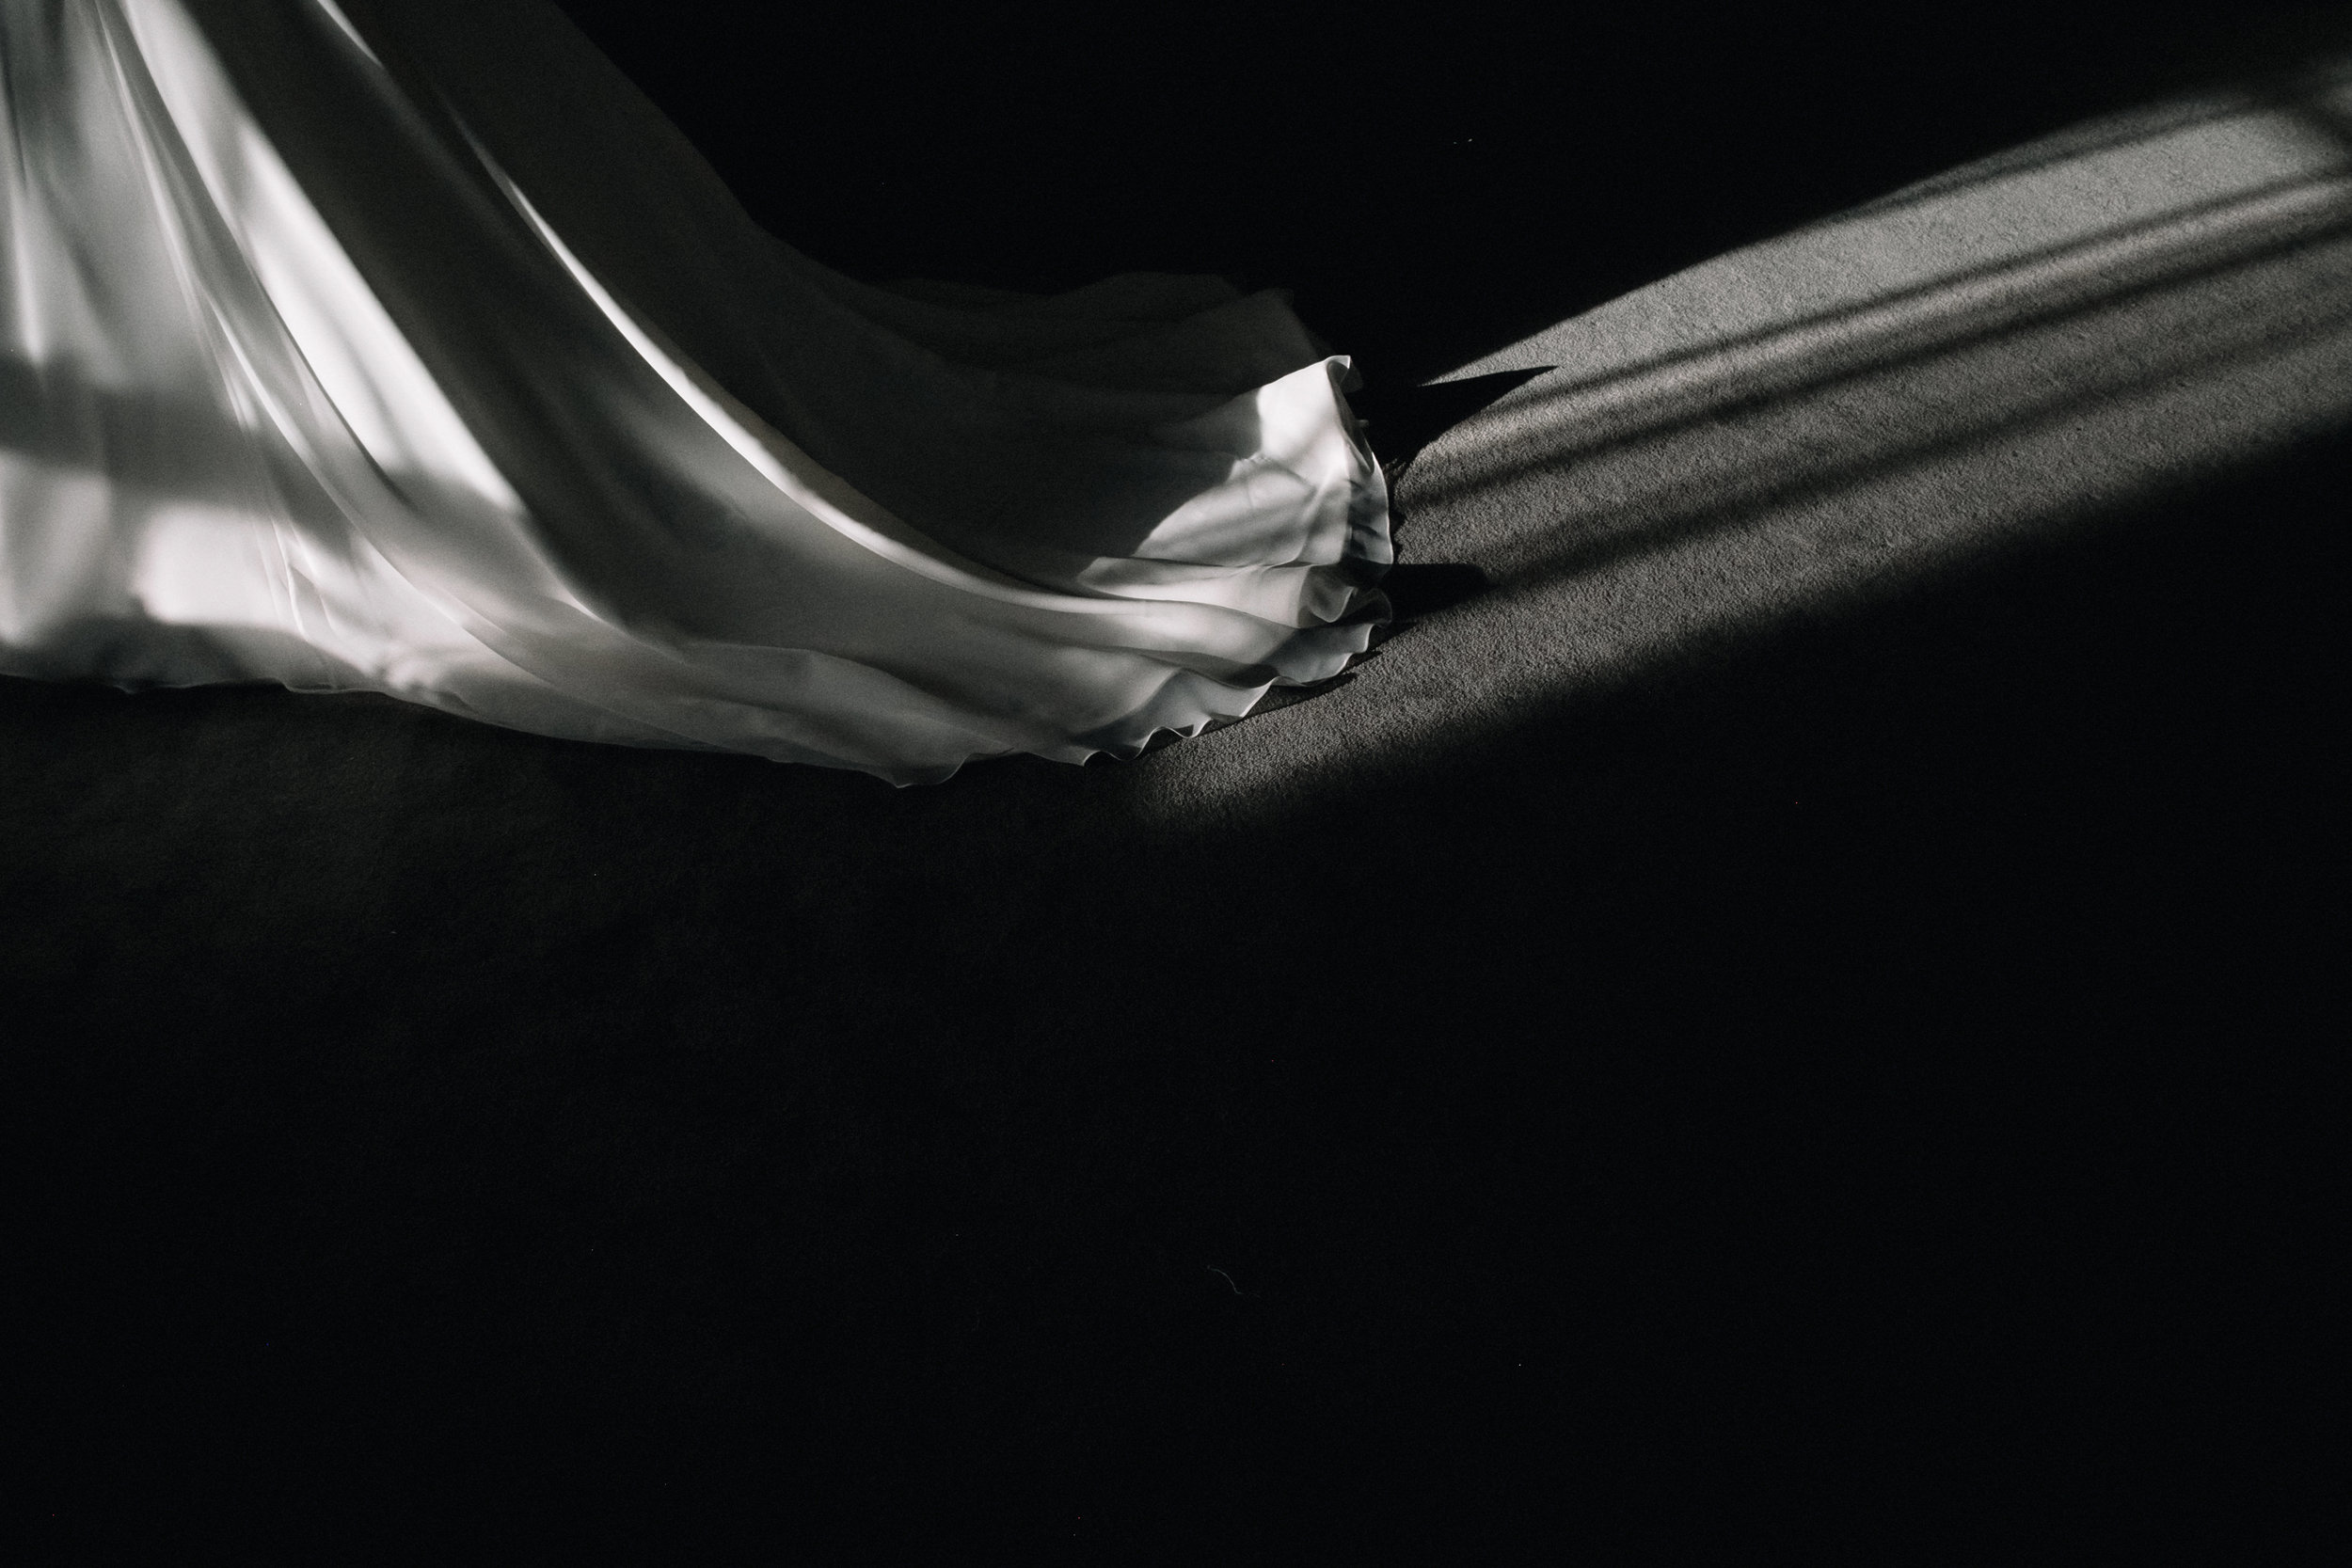 Bridal train in the shadows